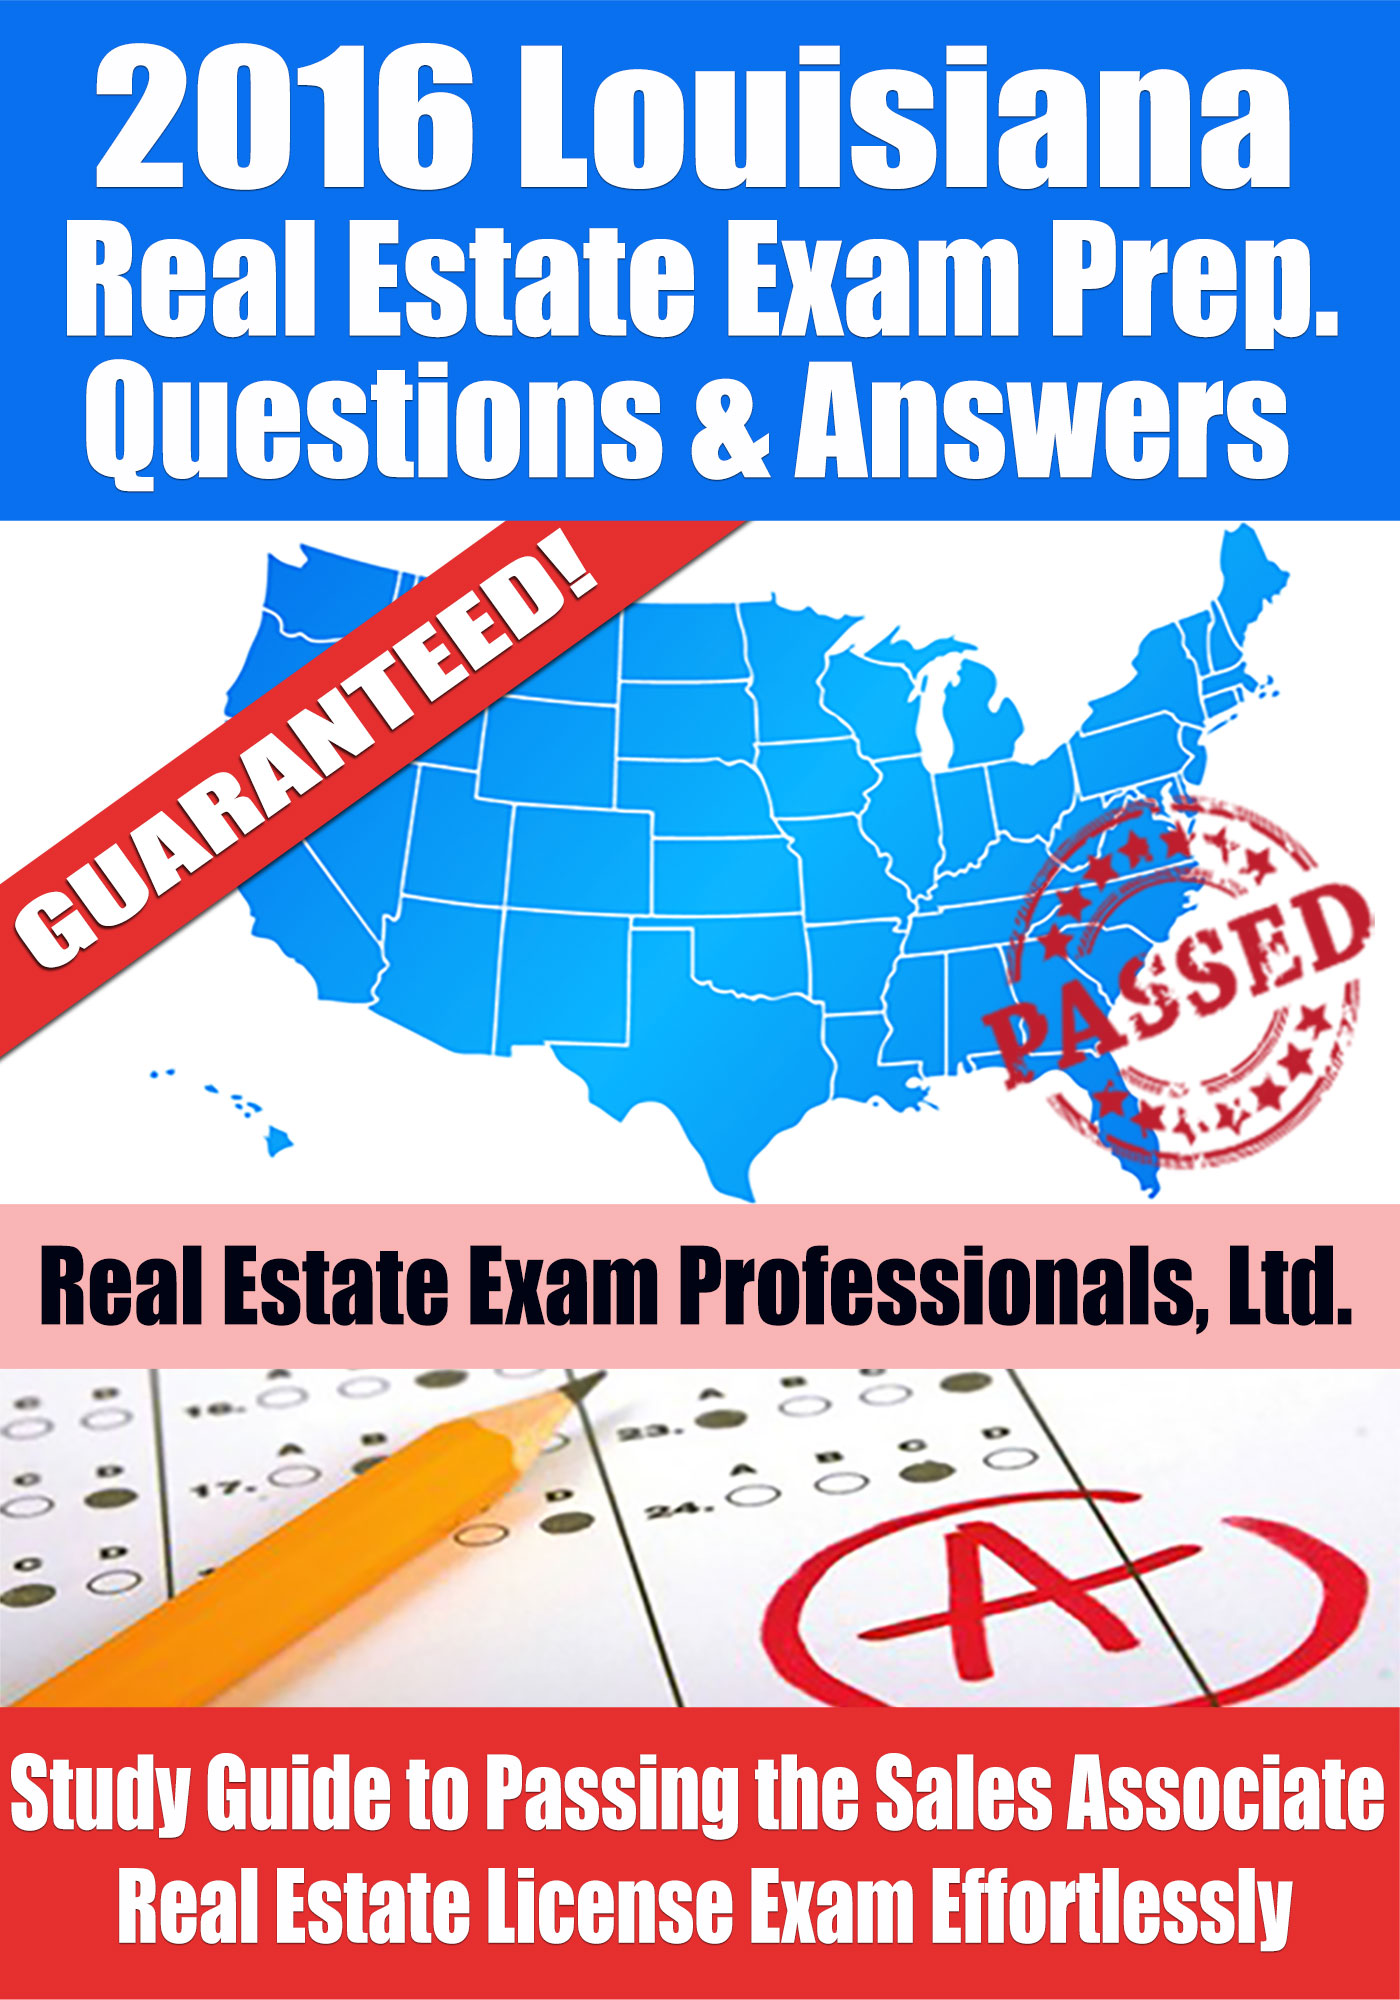 2016 Louisiana Real Estate Exam Prep ...